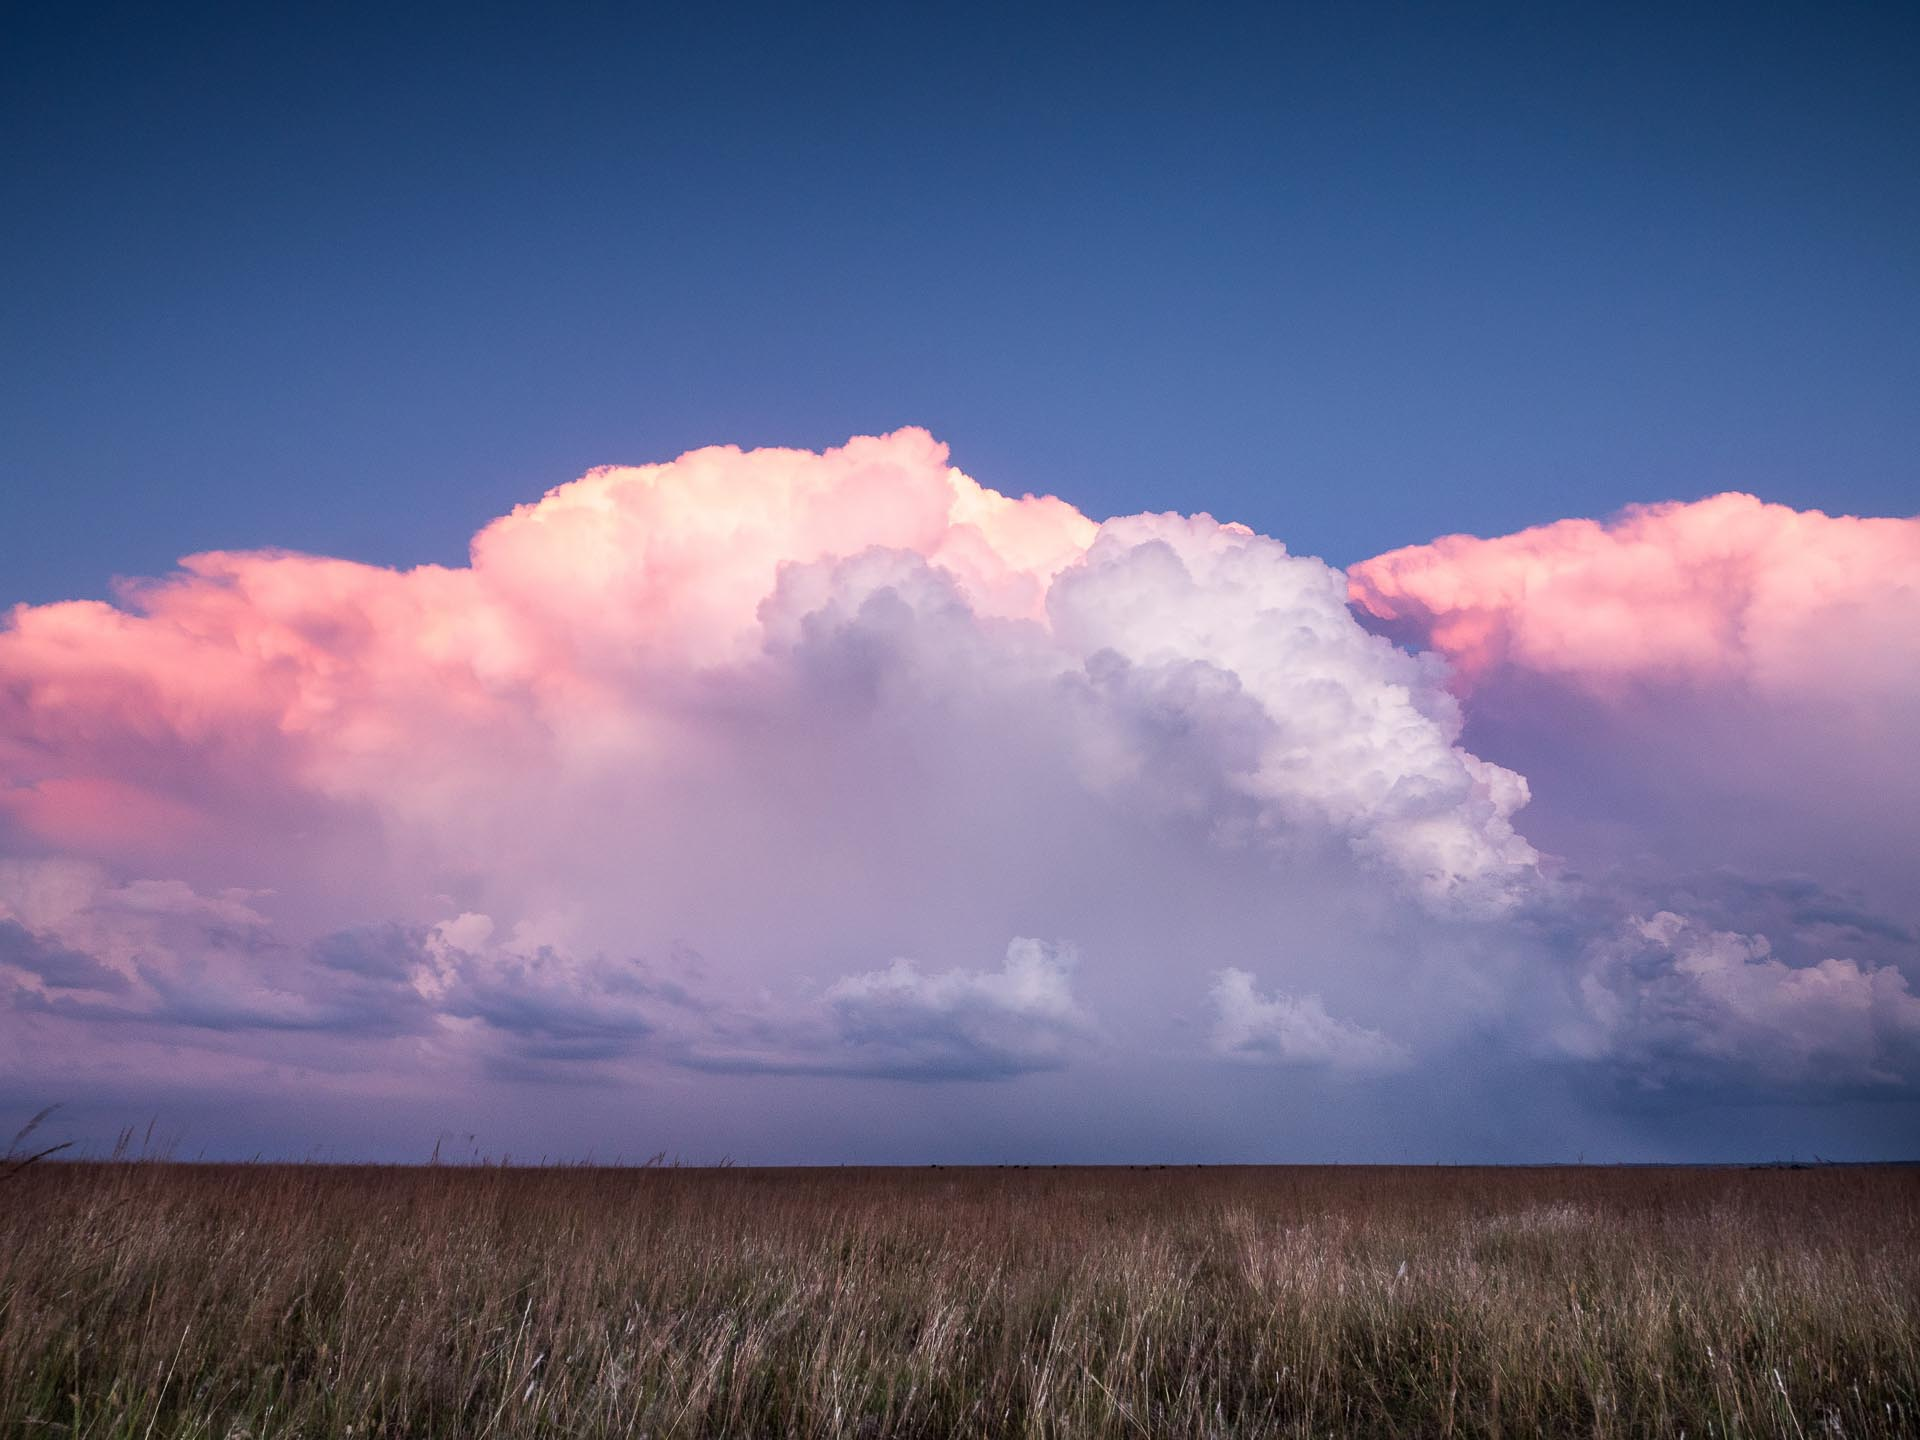 A stormy purple sky over a flat prairie landscape.